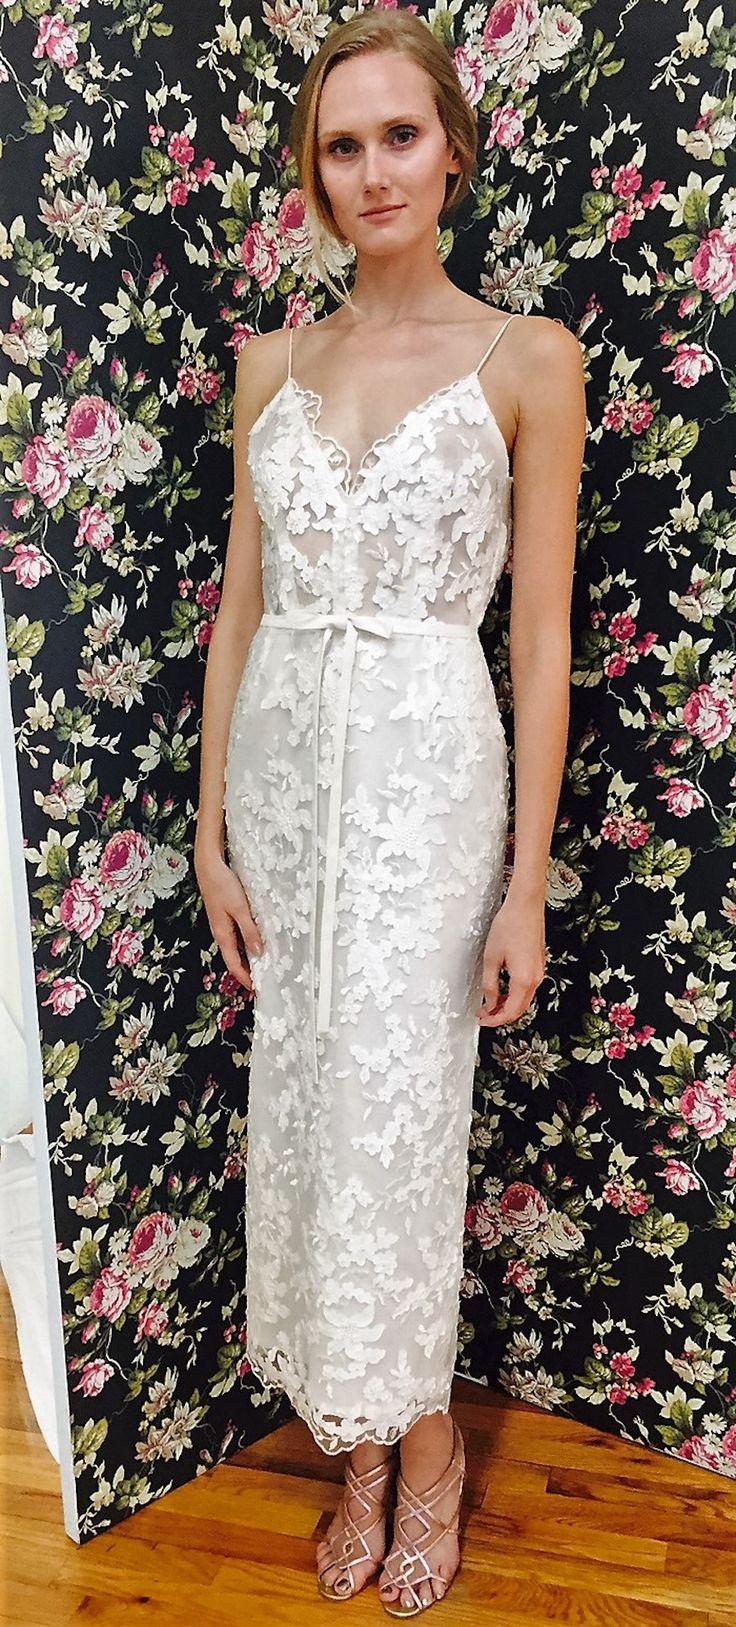 Elizabeth Fillmore Bridal Week Fall 2017 - http://www.stylemepretty.com/2016/10/12/elizabeth-fillmore-bridal-week-fall-2017-wedding-dresses/